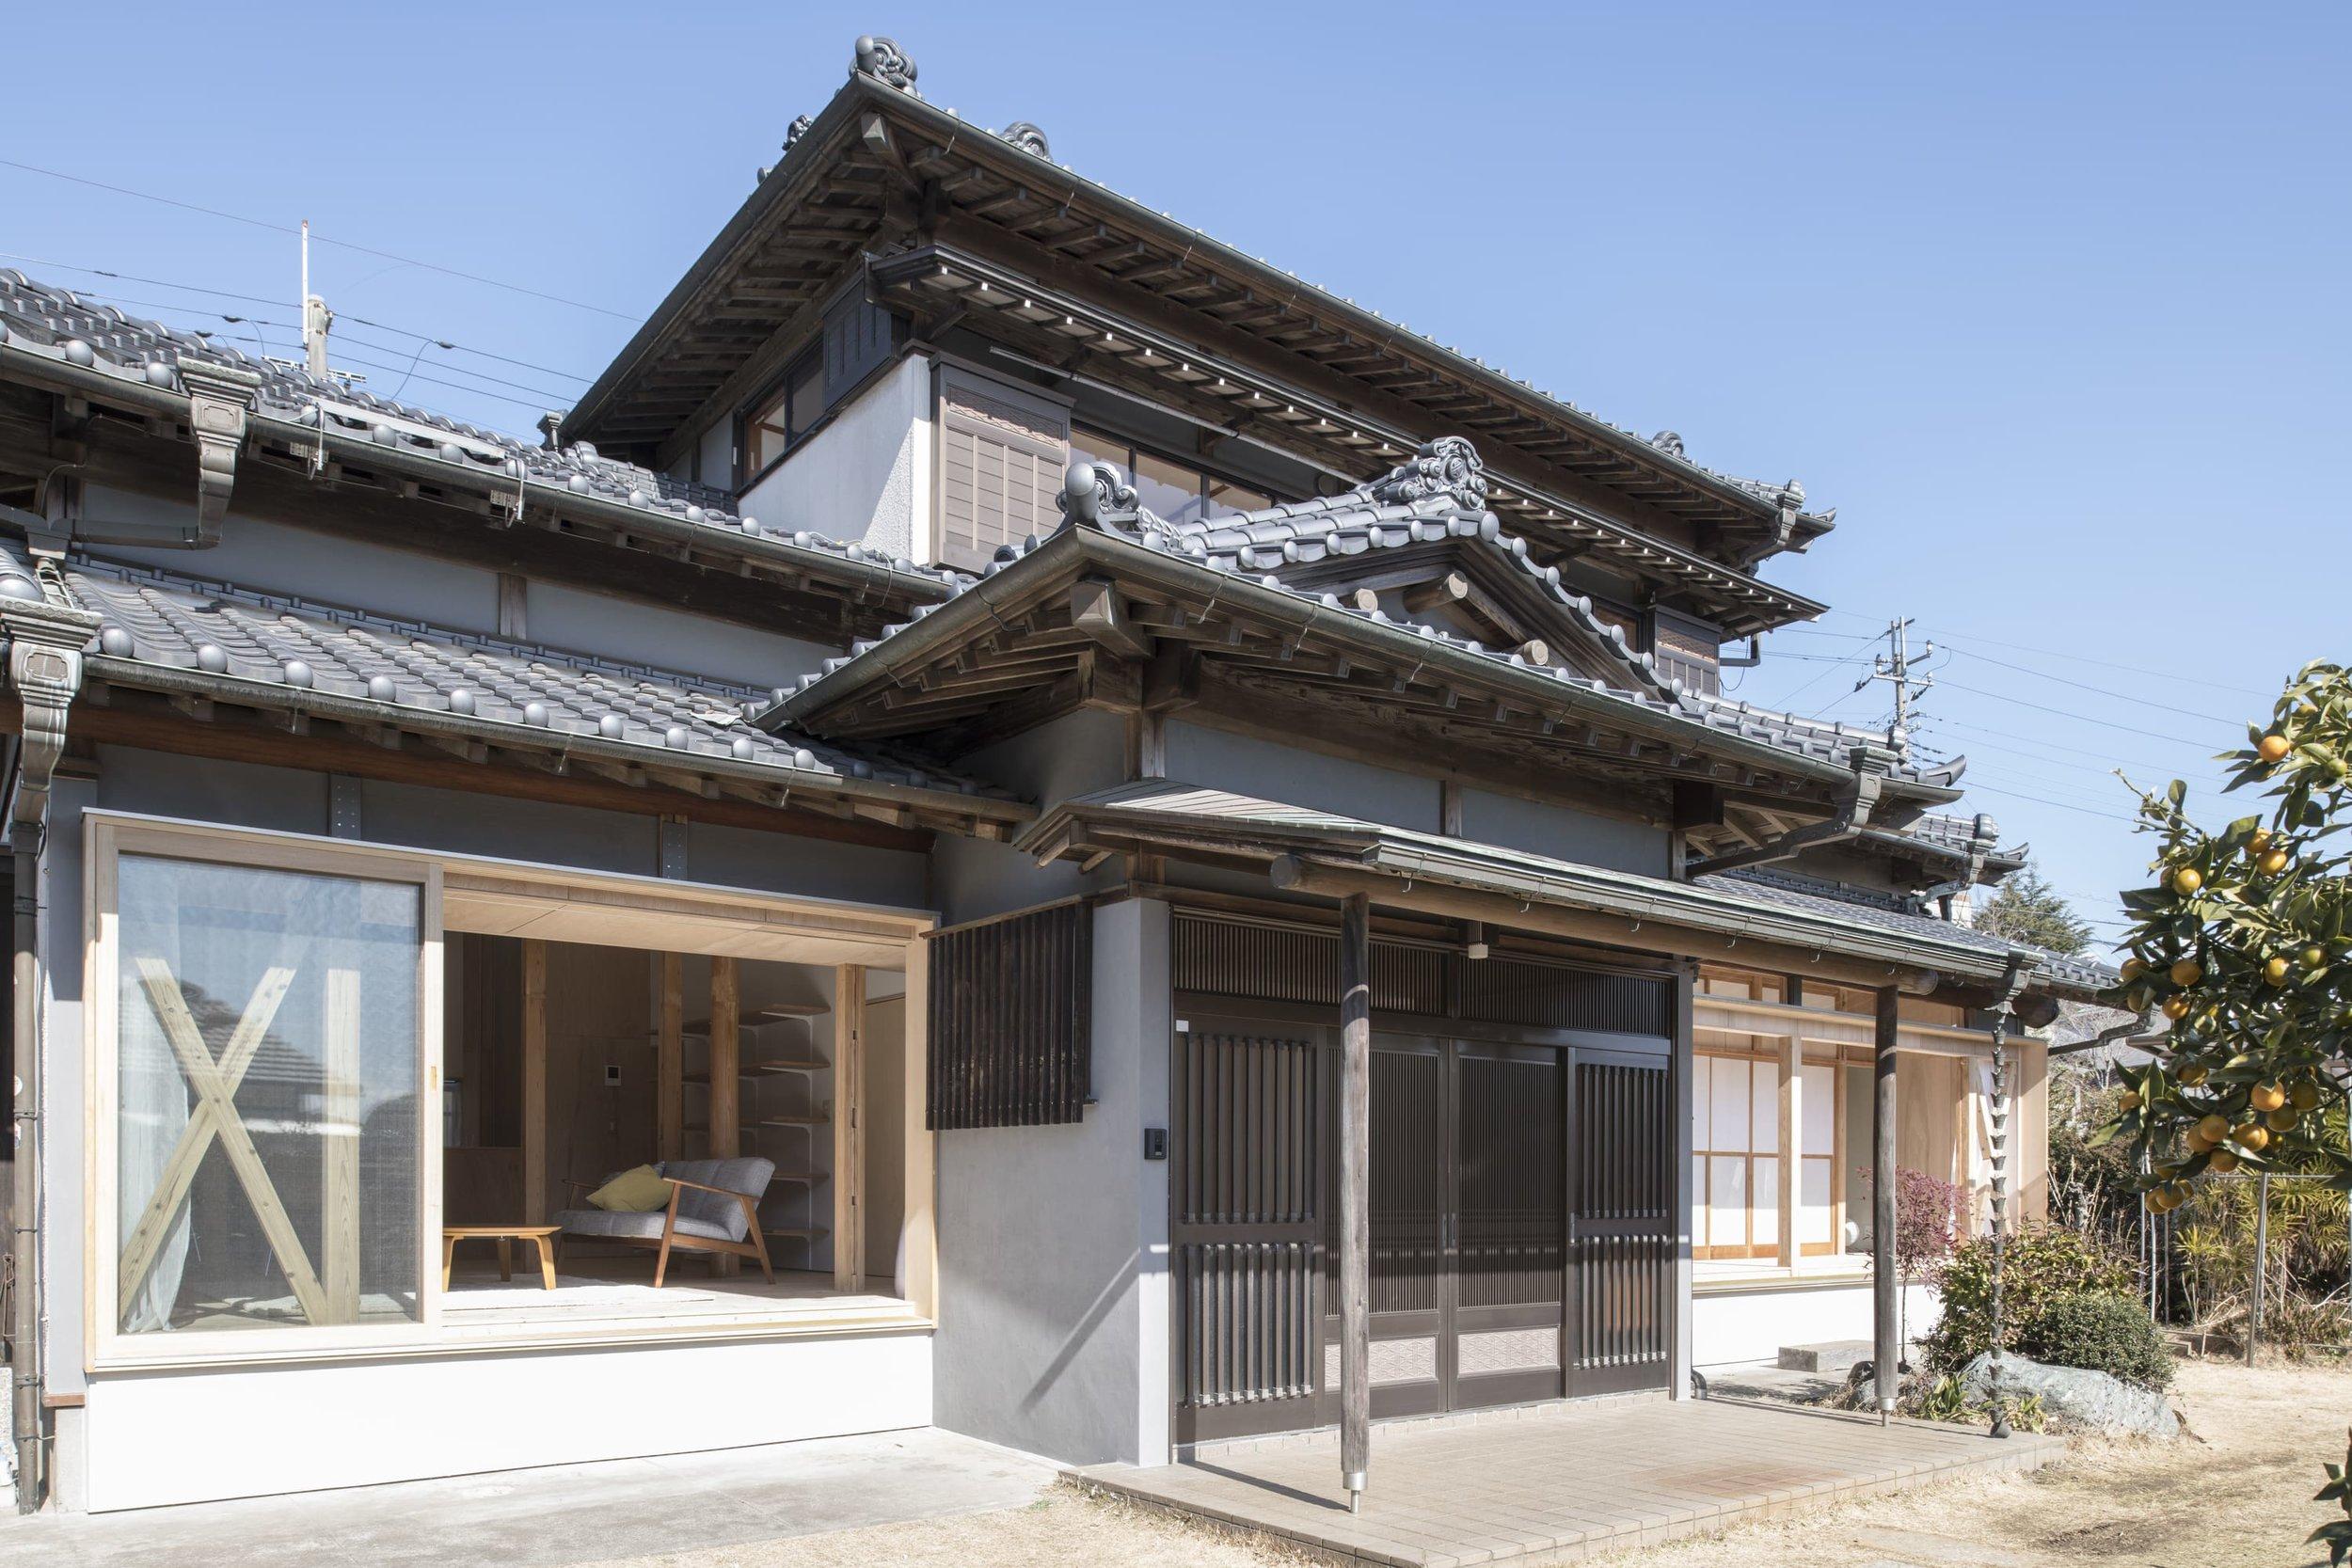 archaic_tokudaction_HouseinSakura_1.jpg